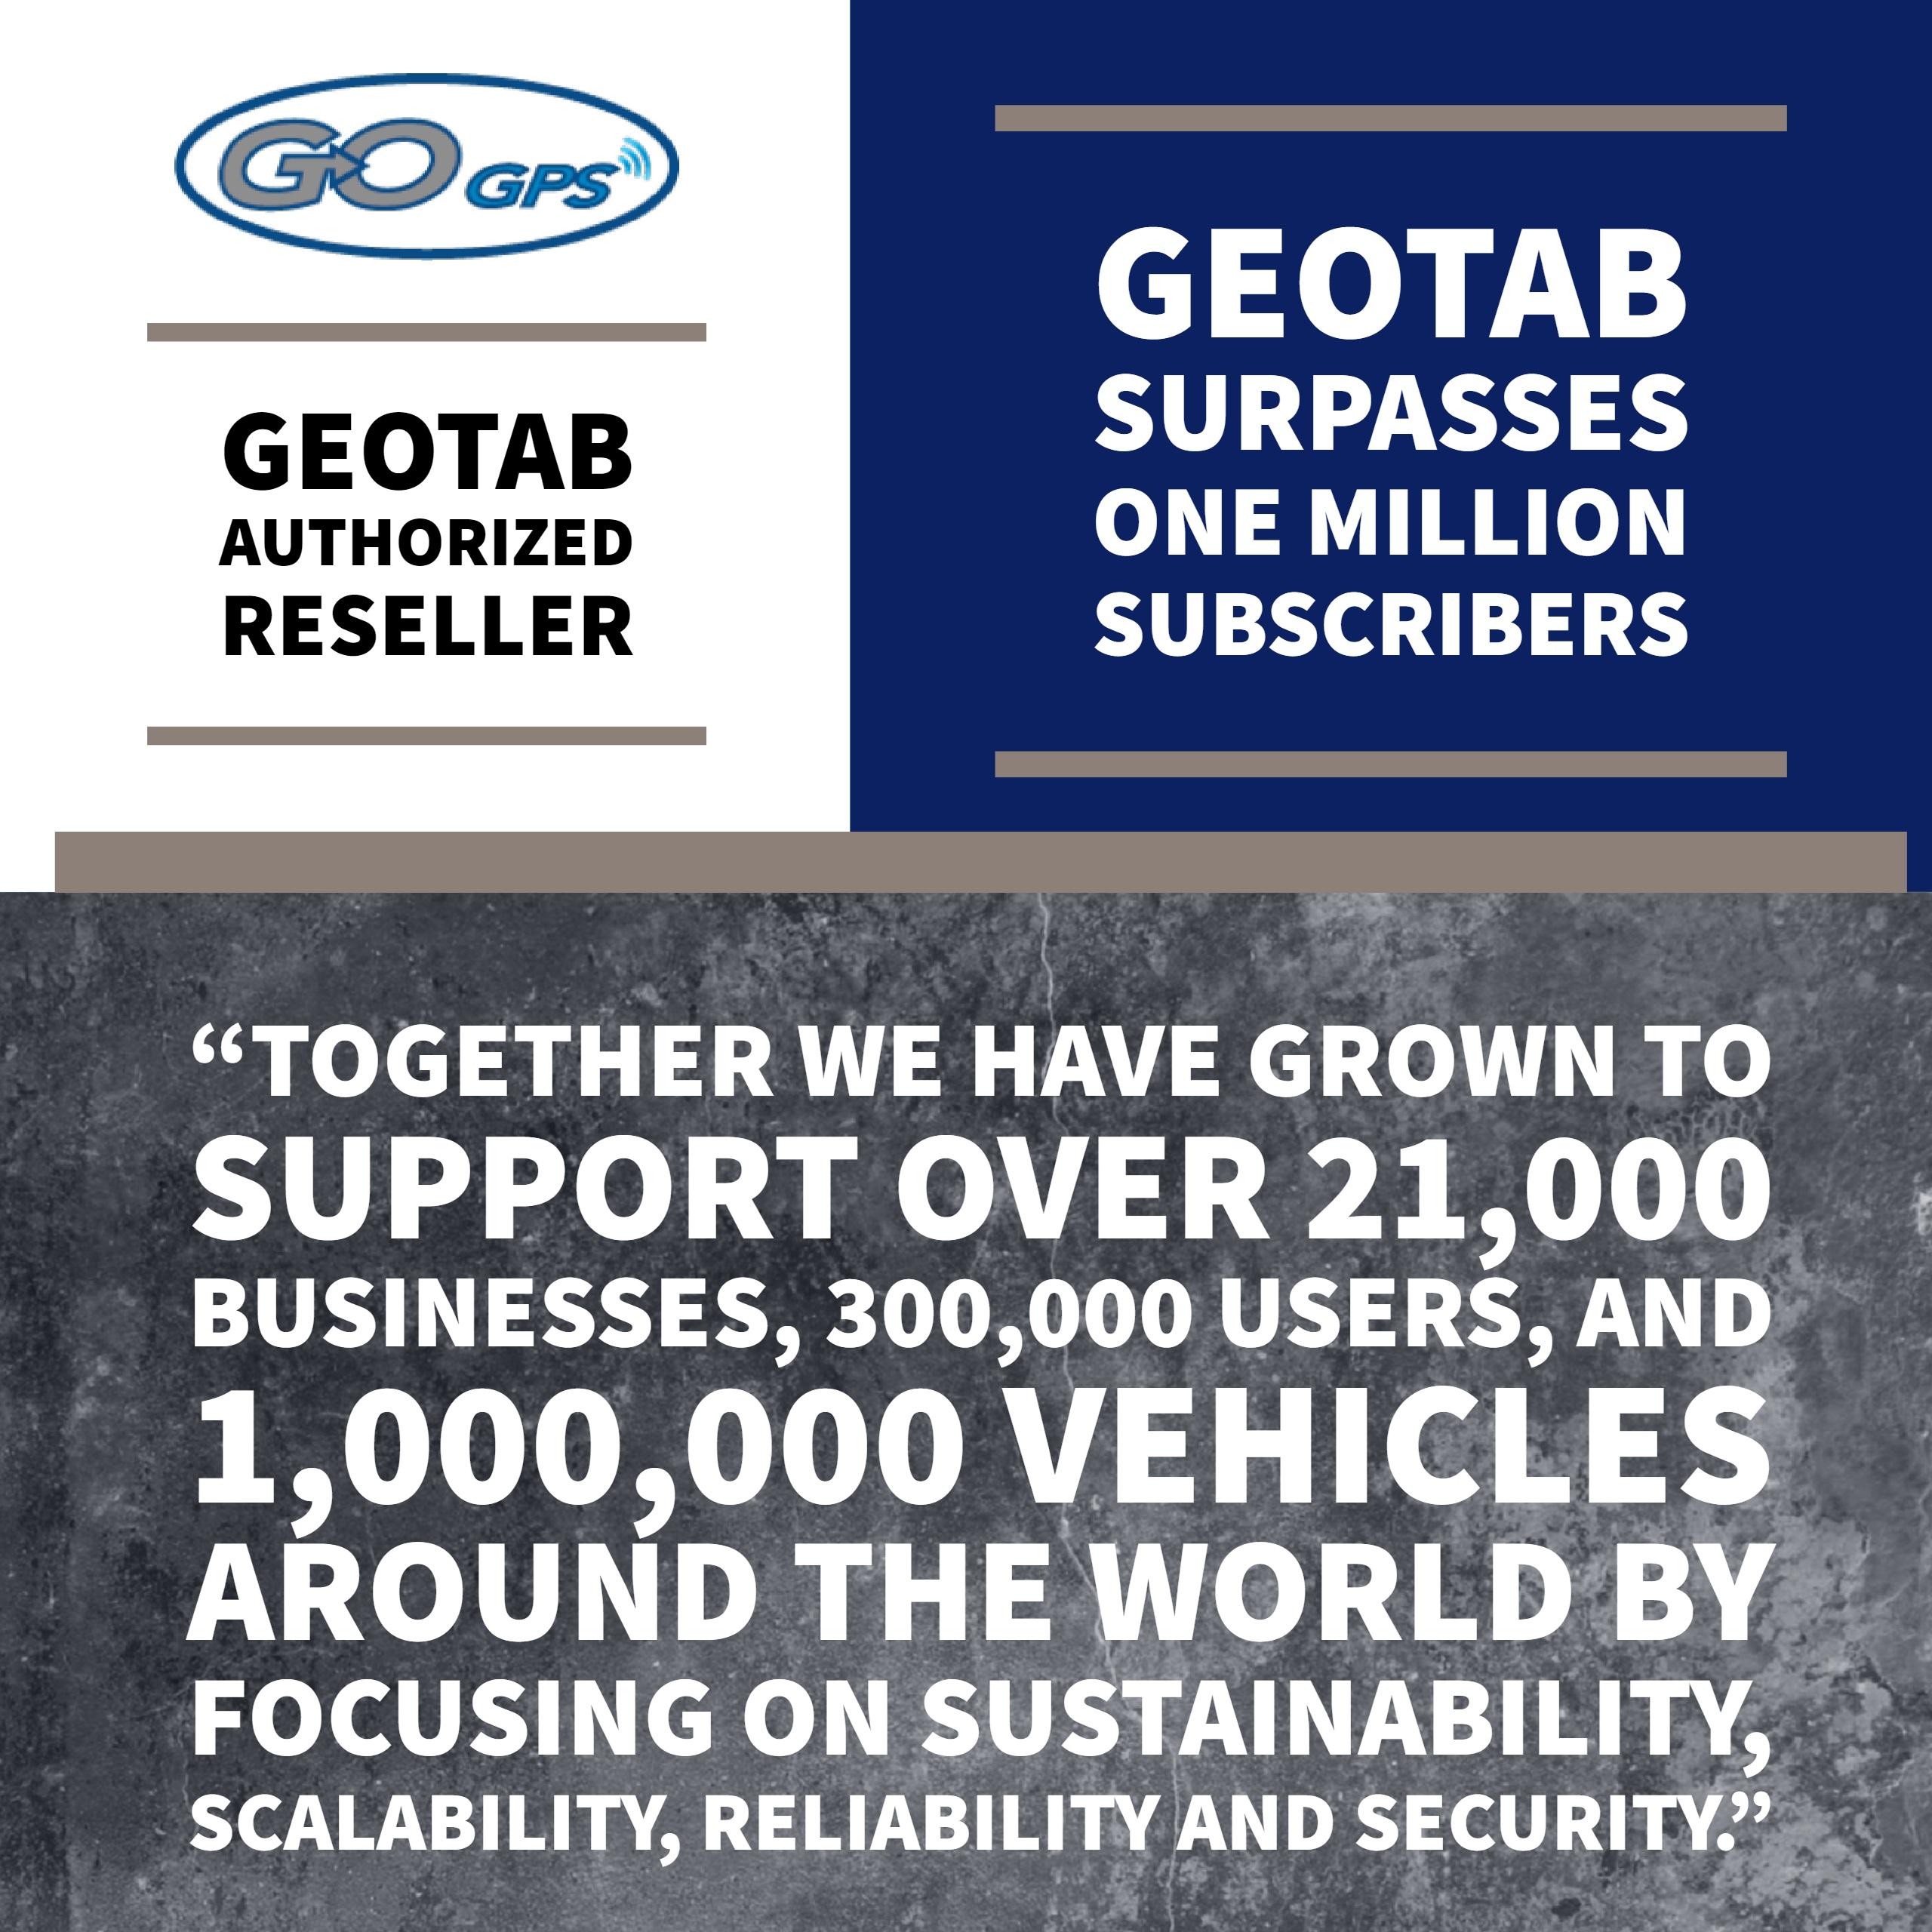 Geotab Surpasses One Million Subscribers